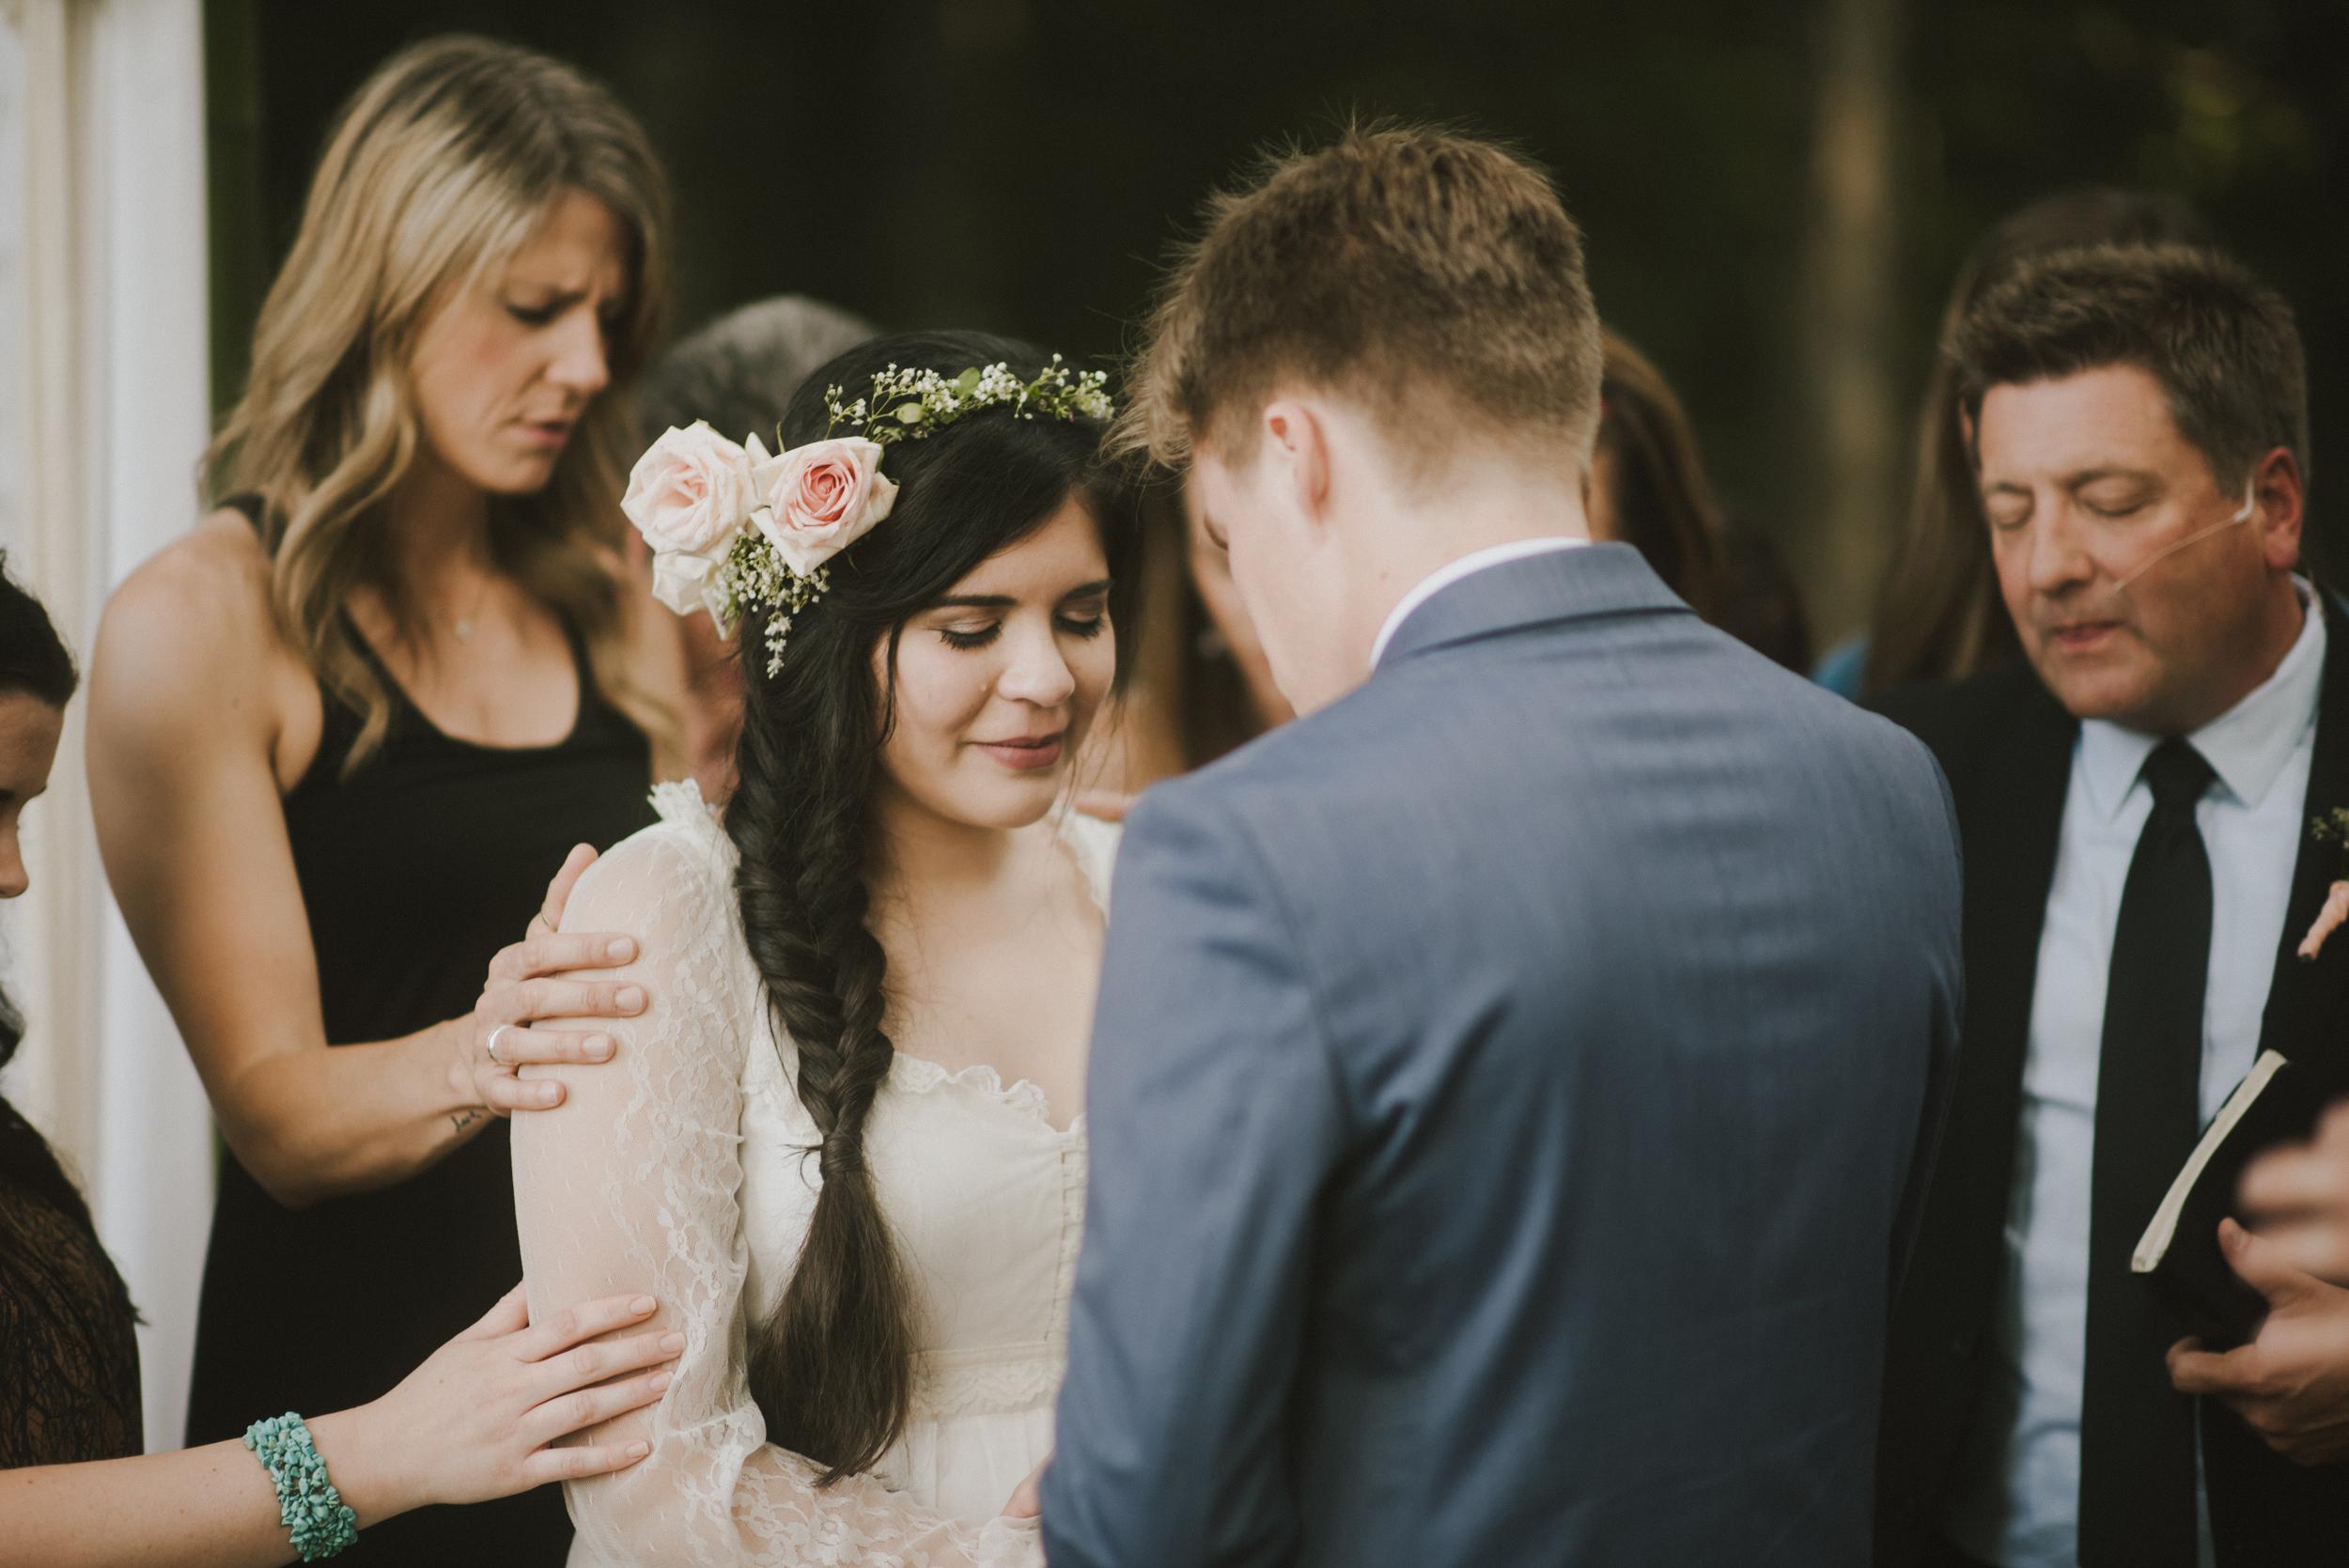 ofRen_weddingphotographer-137.jpg